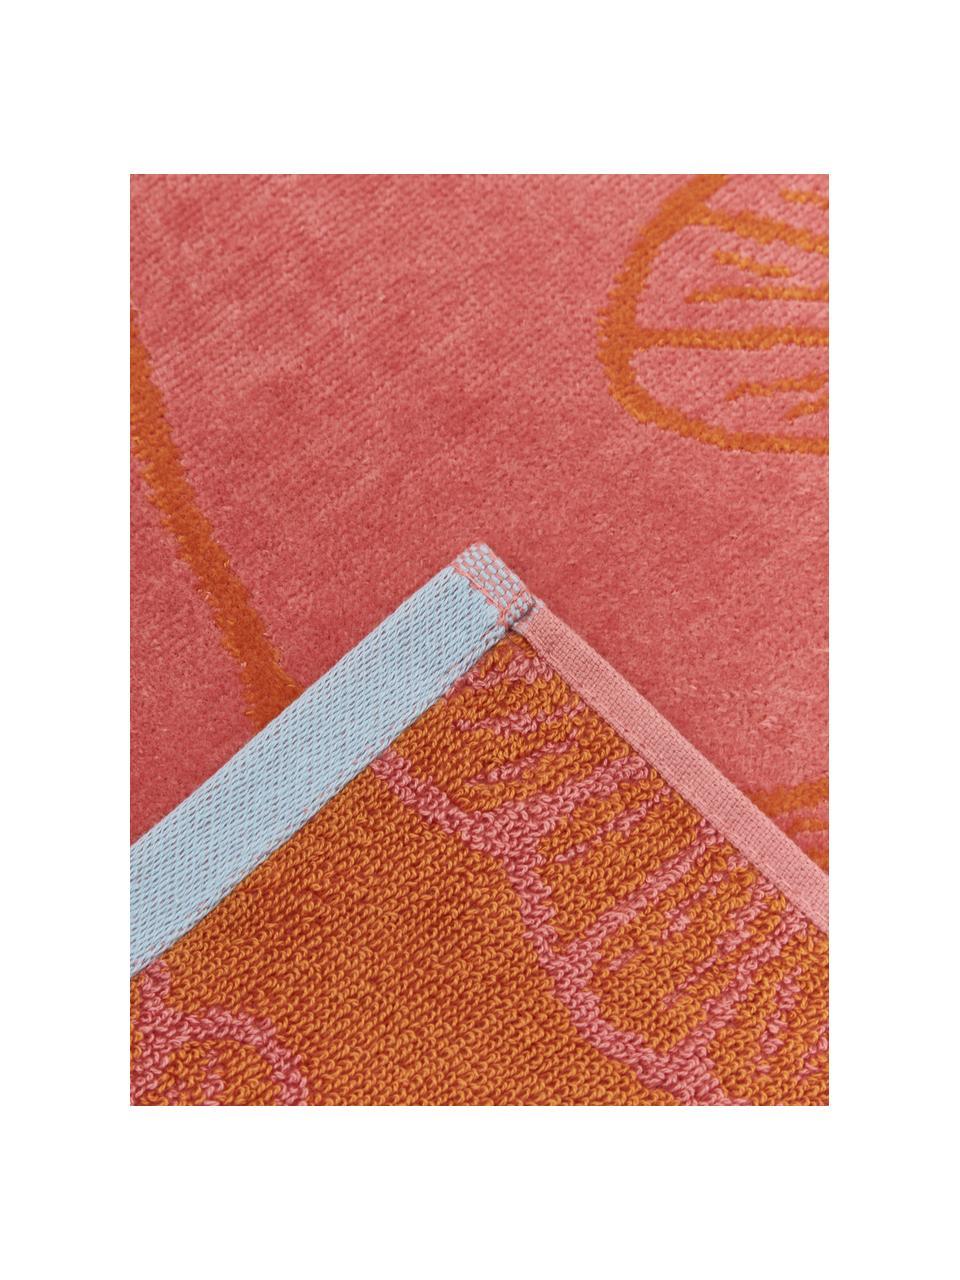 Strandtuch Burnt Sky mit Ginkgomotiv, 100% Baumwolle, Rosa, 100 x 180 cm